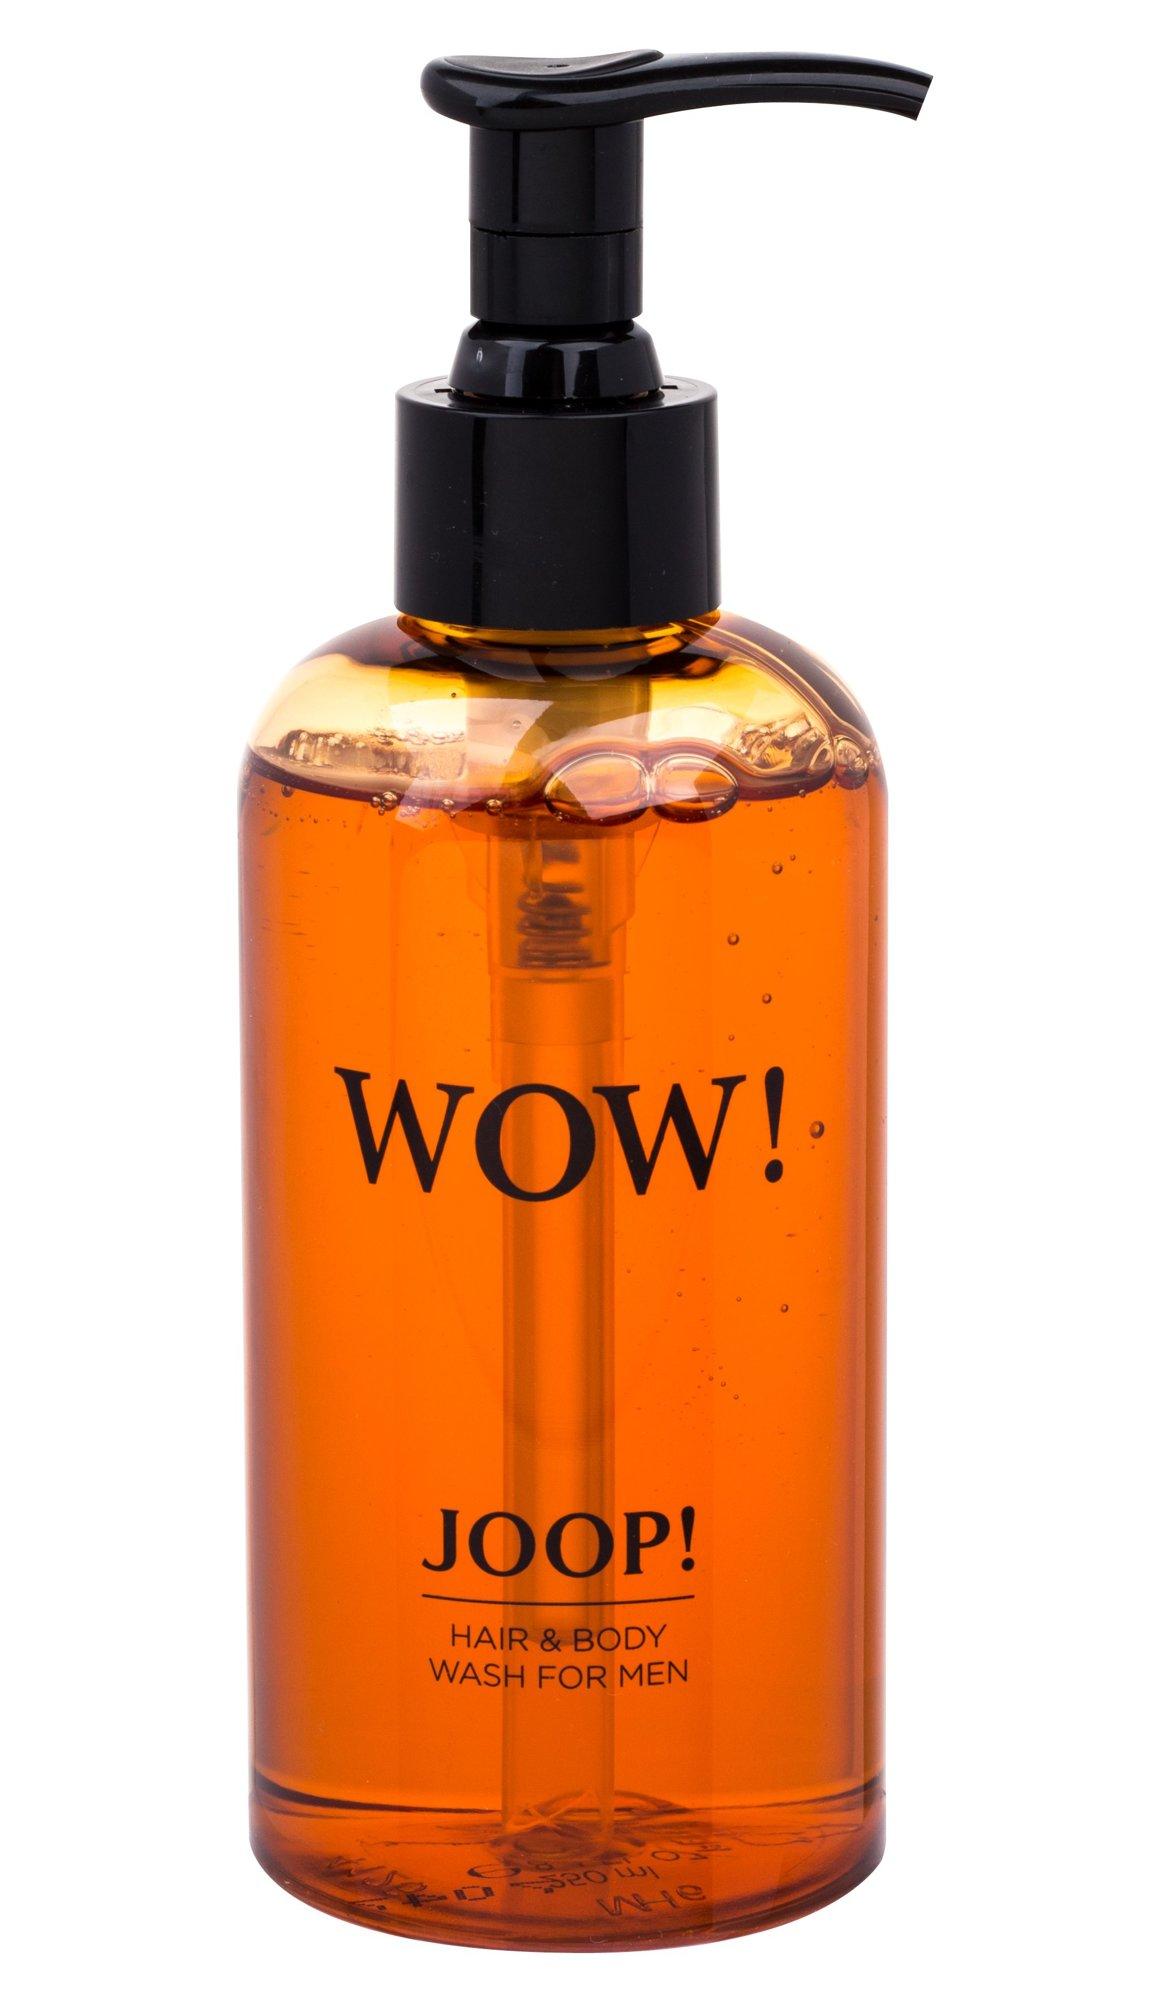 JOOP! Wow Shower Gel 250ml